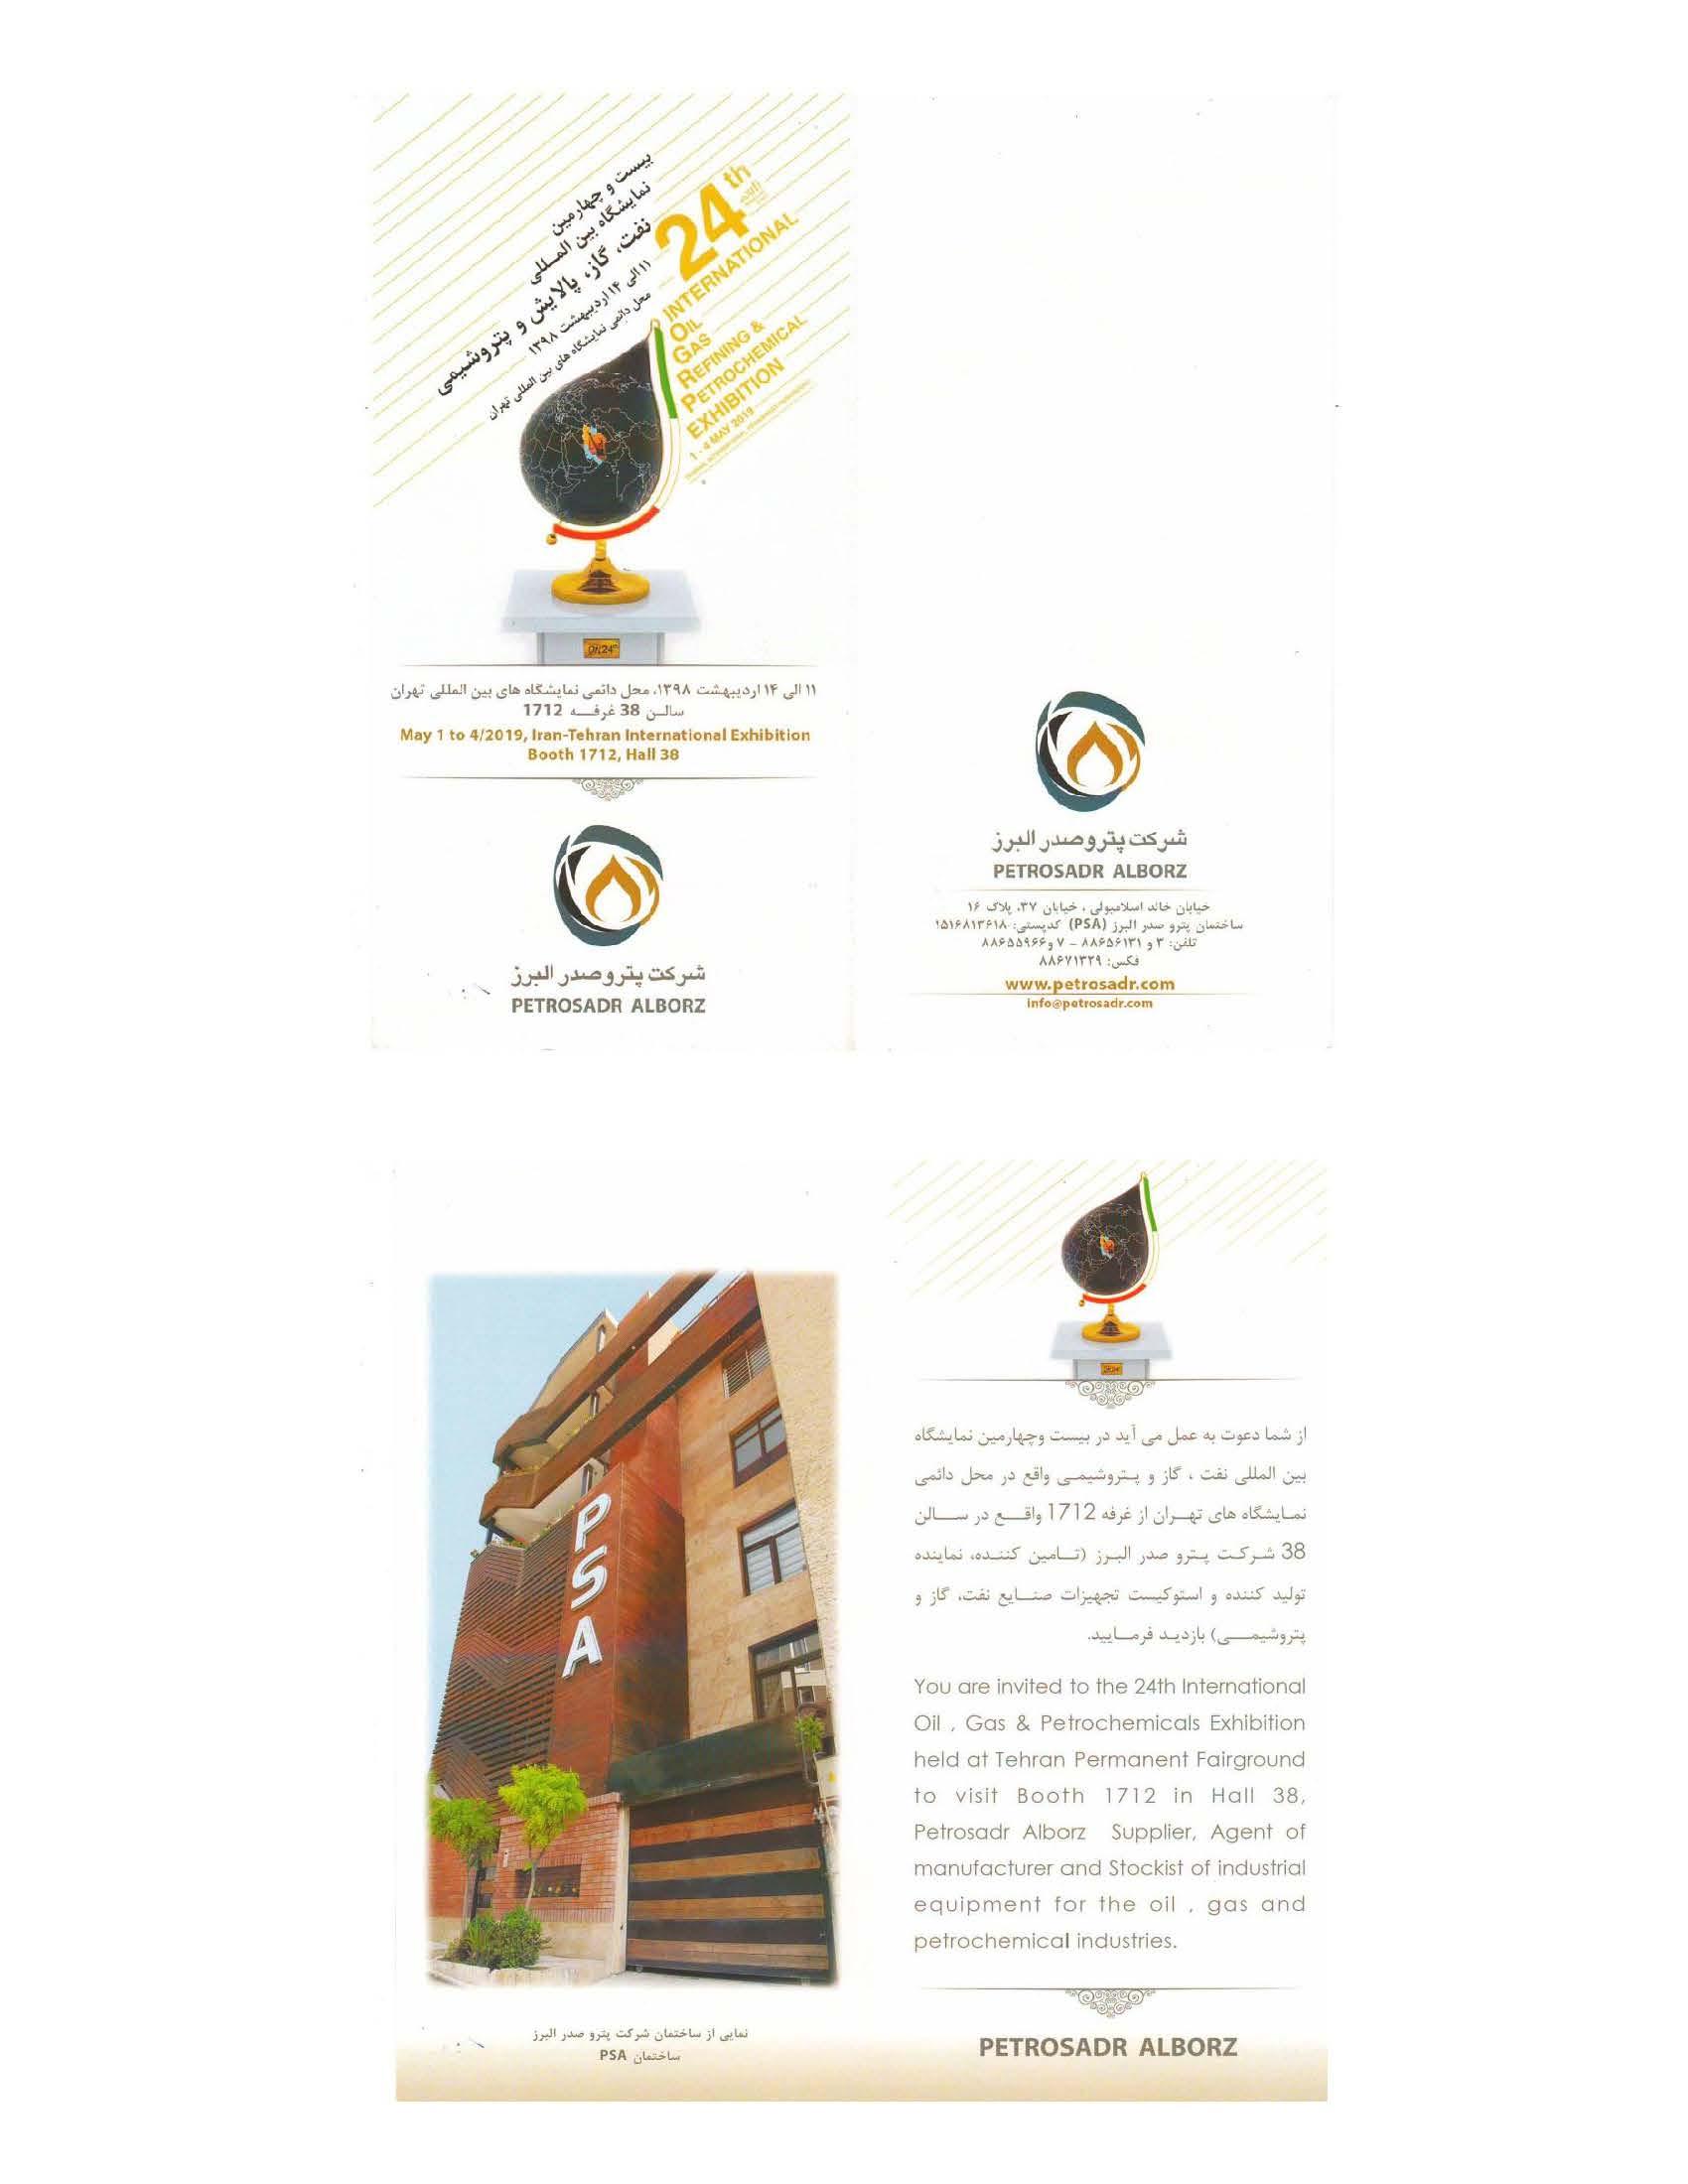 Invitation To Exhibition Booth : Psa in th international oil gas exhibition petro sadr alborz